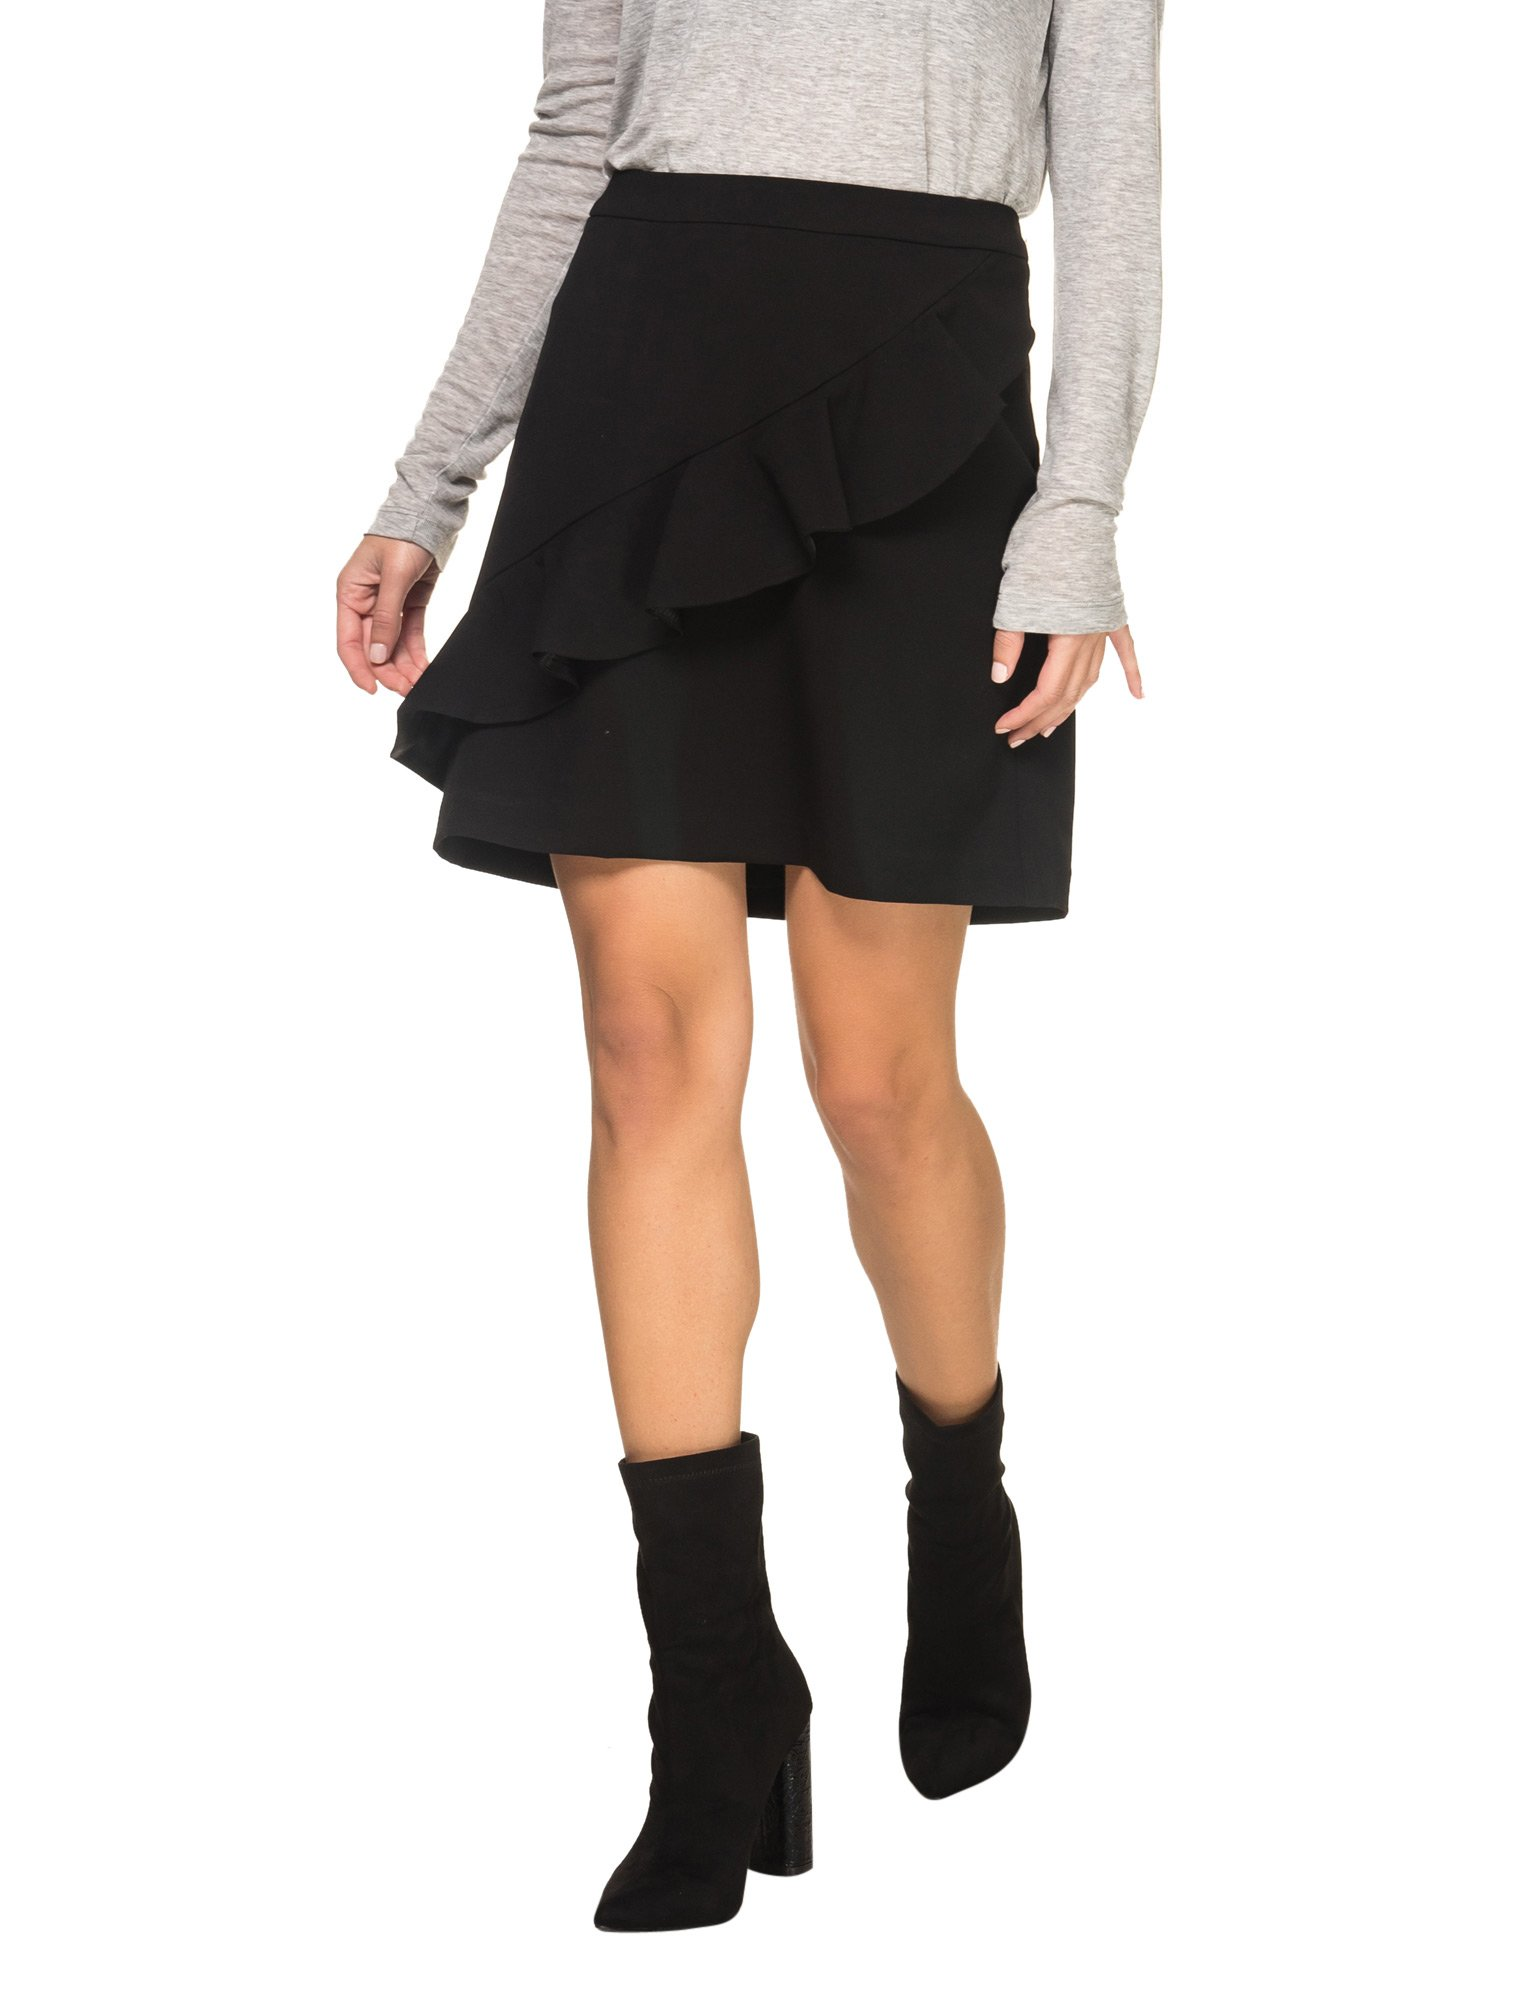 B.YOUNG Women's Danali Women's Black Skirt With Ruffles In Size 36-S Black